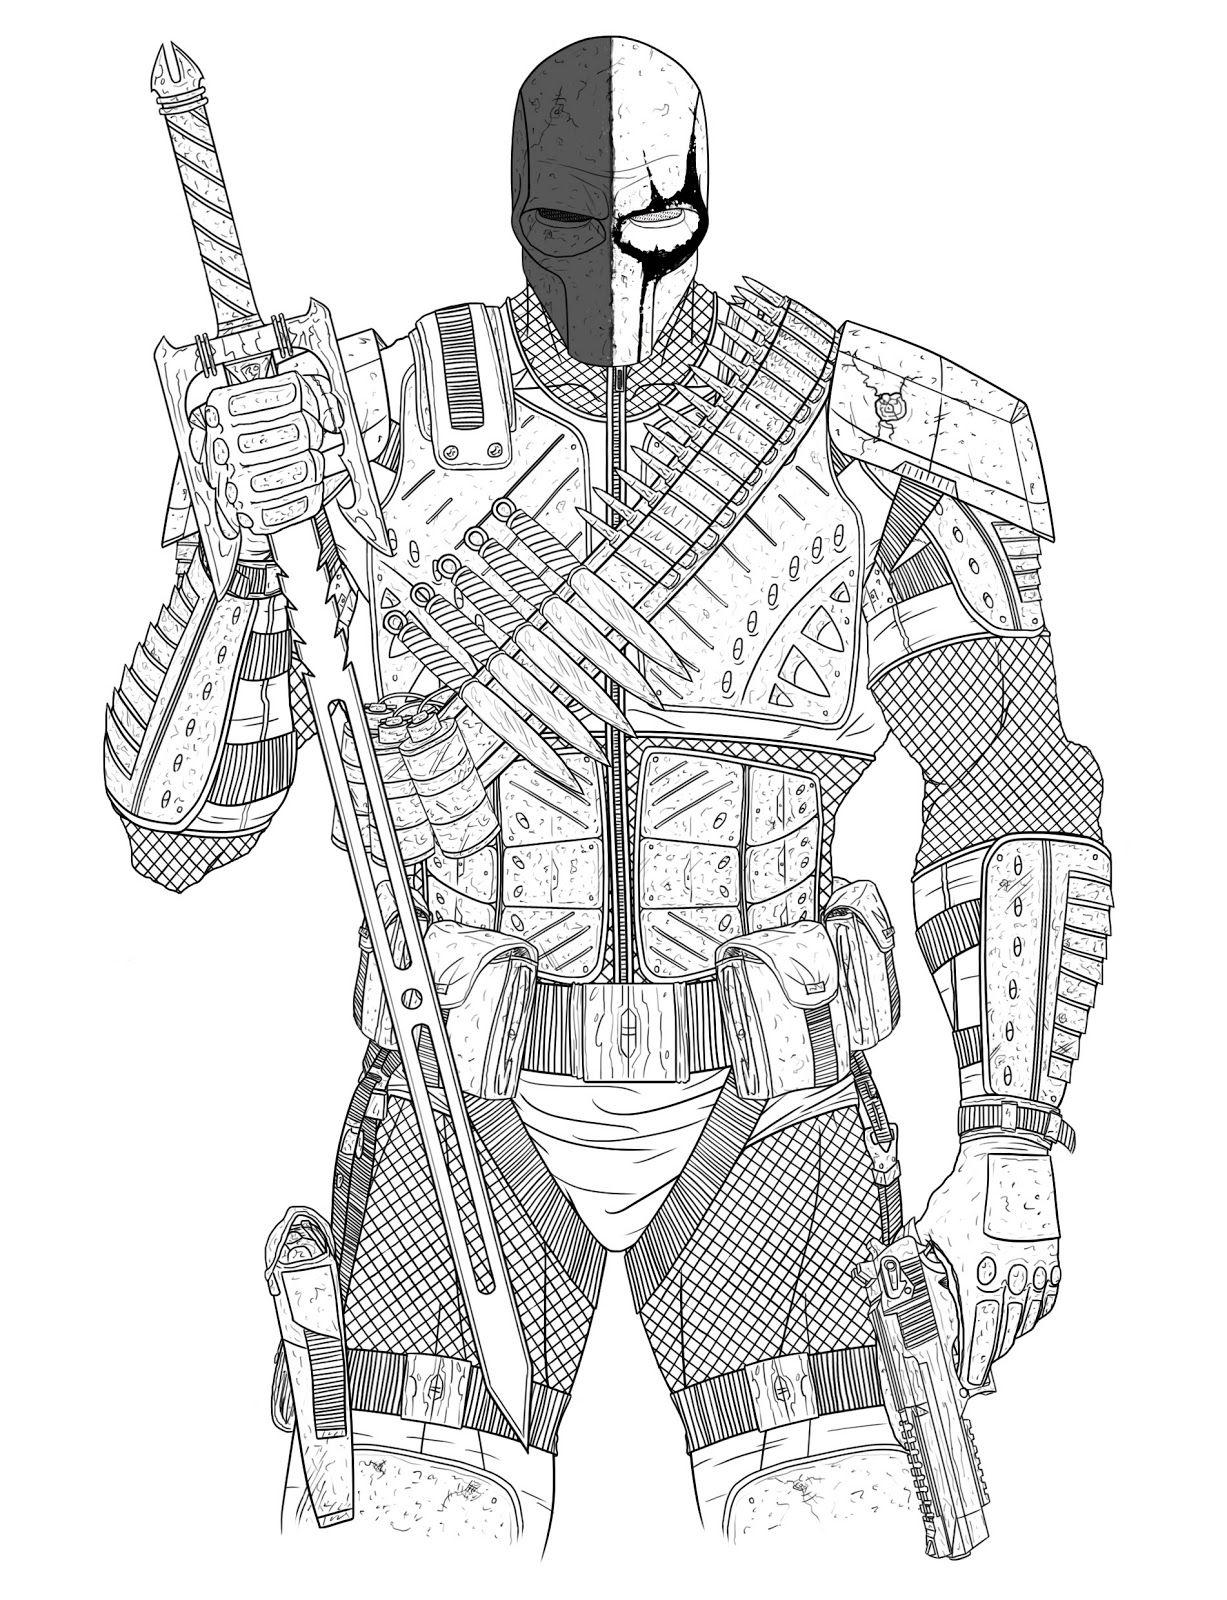 Deathstroke Digital Sketch Deathstroke Batman Coloring Pages Deathstroke The Terminator